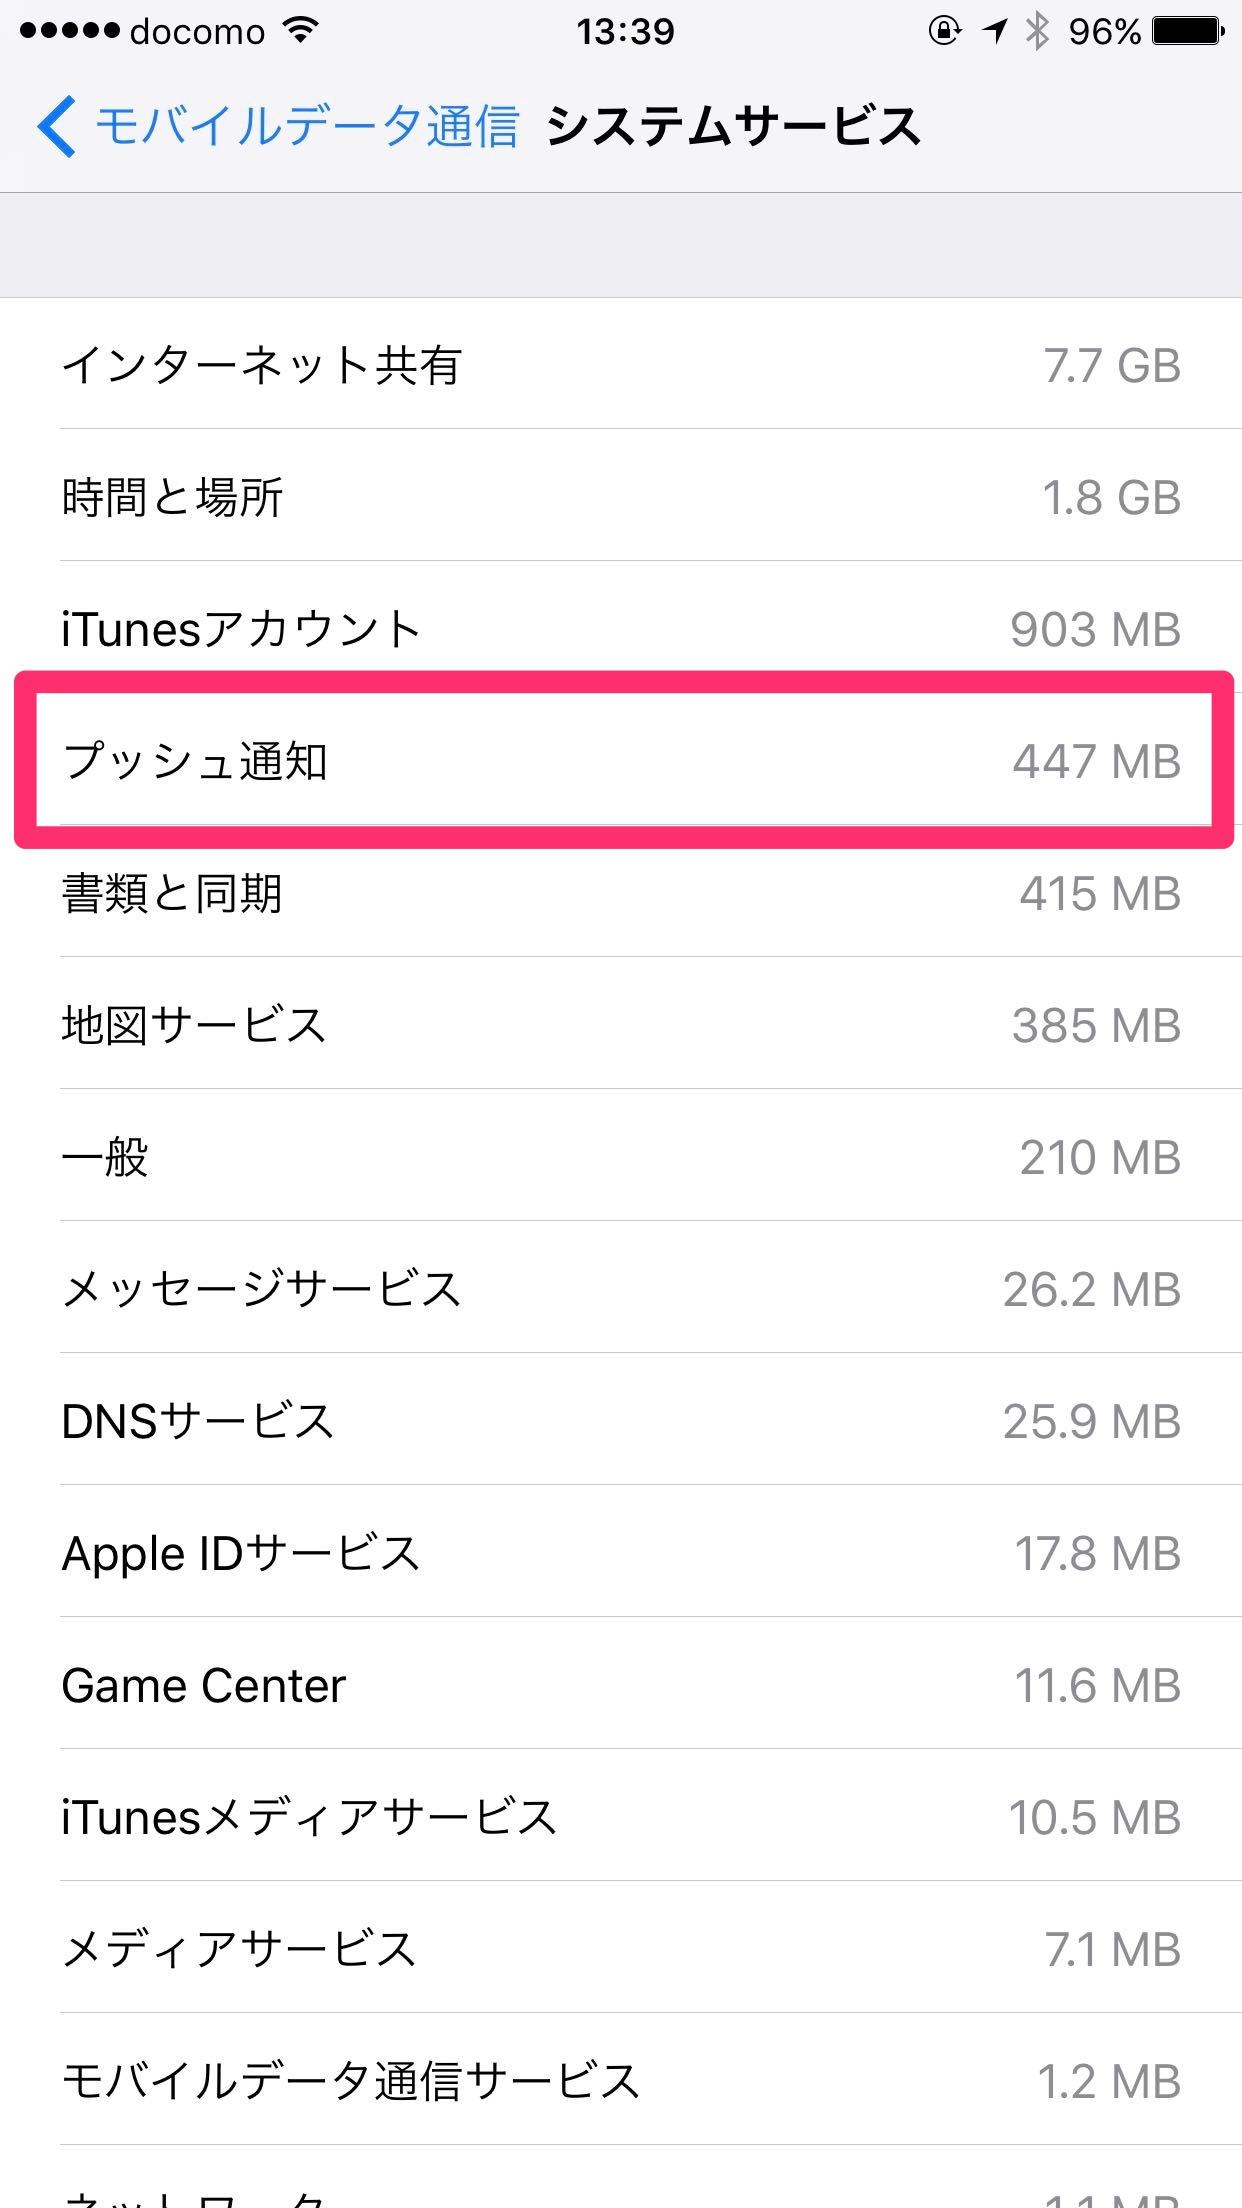 【iOS 10】プッシュ通知が使用するパケット量は最長4キロバイト